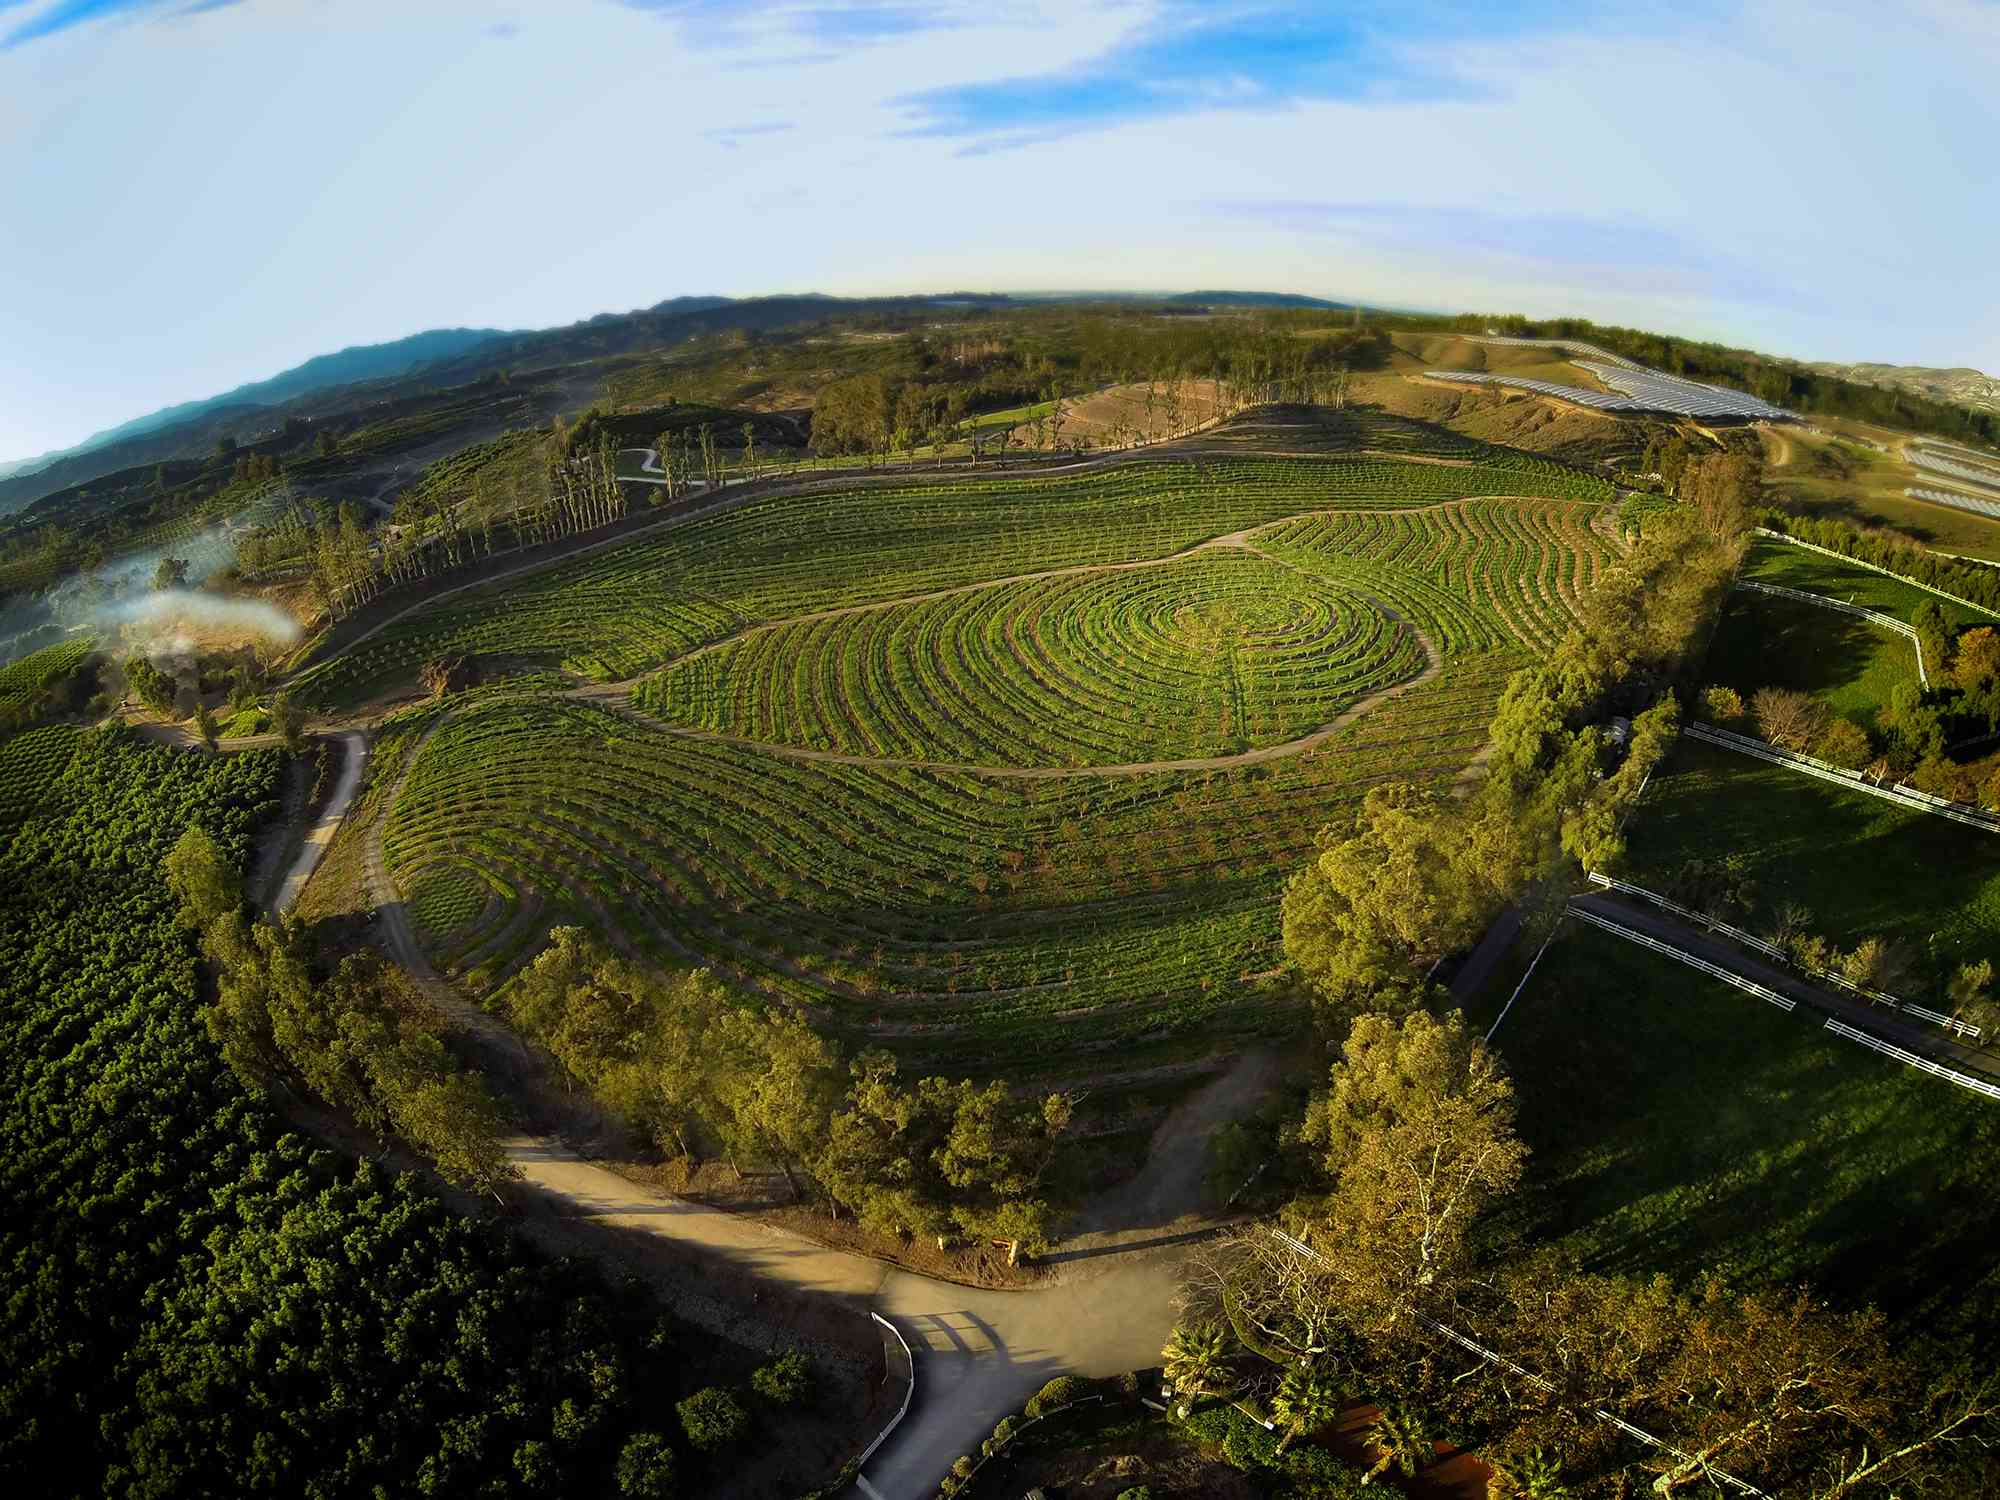 Aerial shot of the farm in Biggest Little Farm